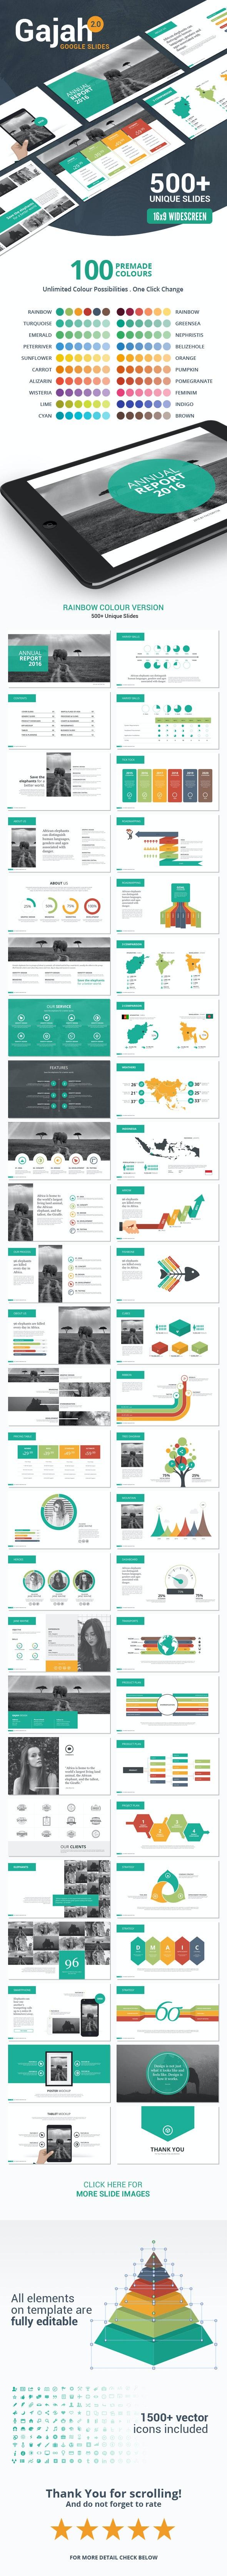 Gajah | Google Slides Template - Google Slides Presentation Templates